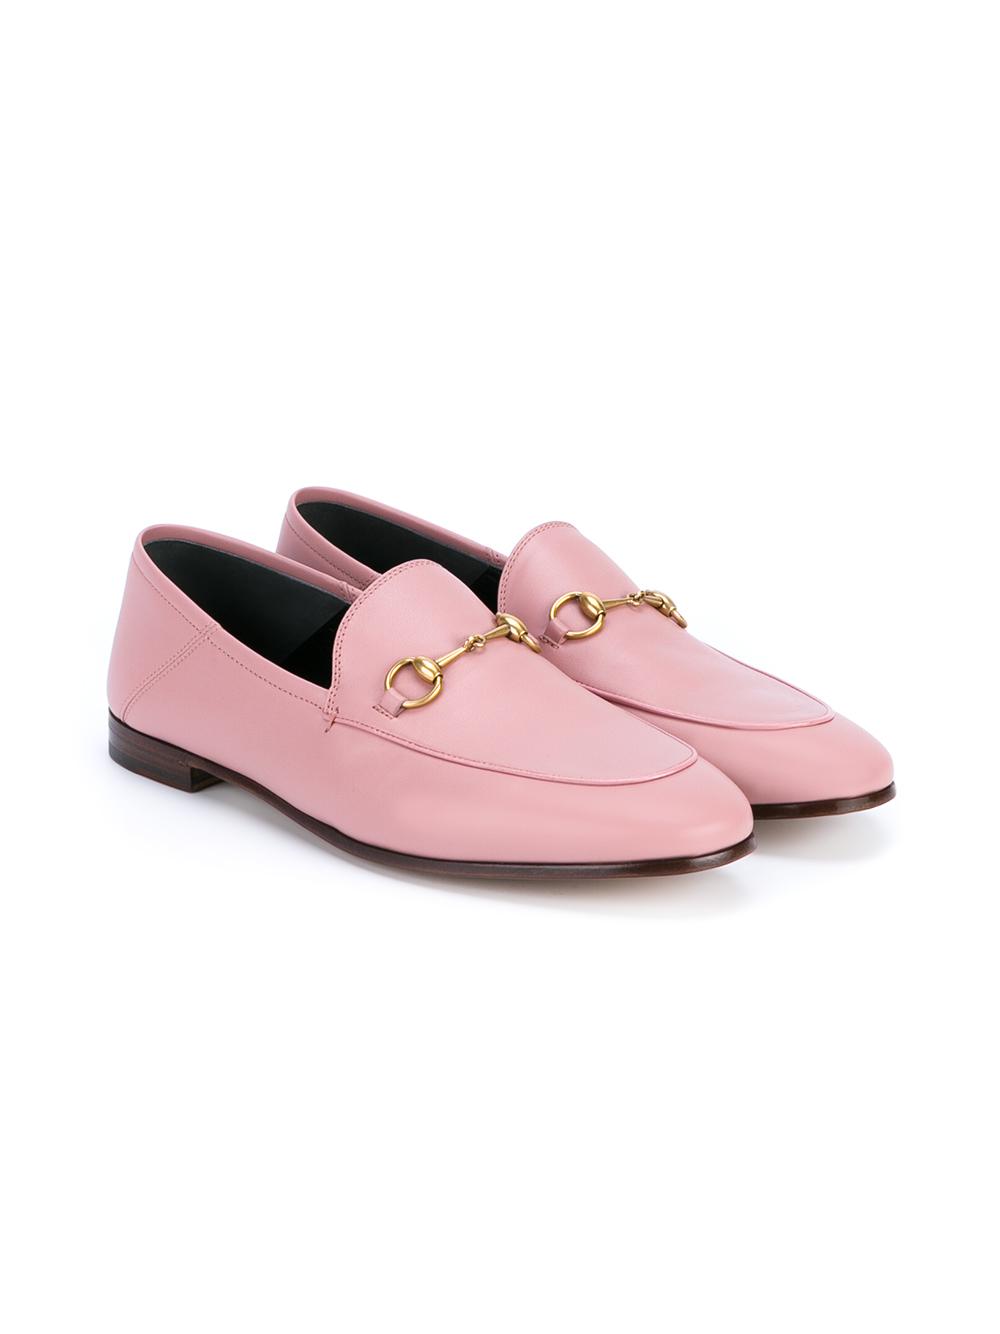 c1ce03181798 Lyst - Gucci Jordaan Horsebit Loafers in Pink